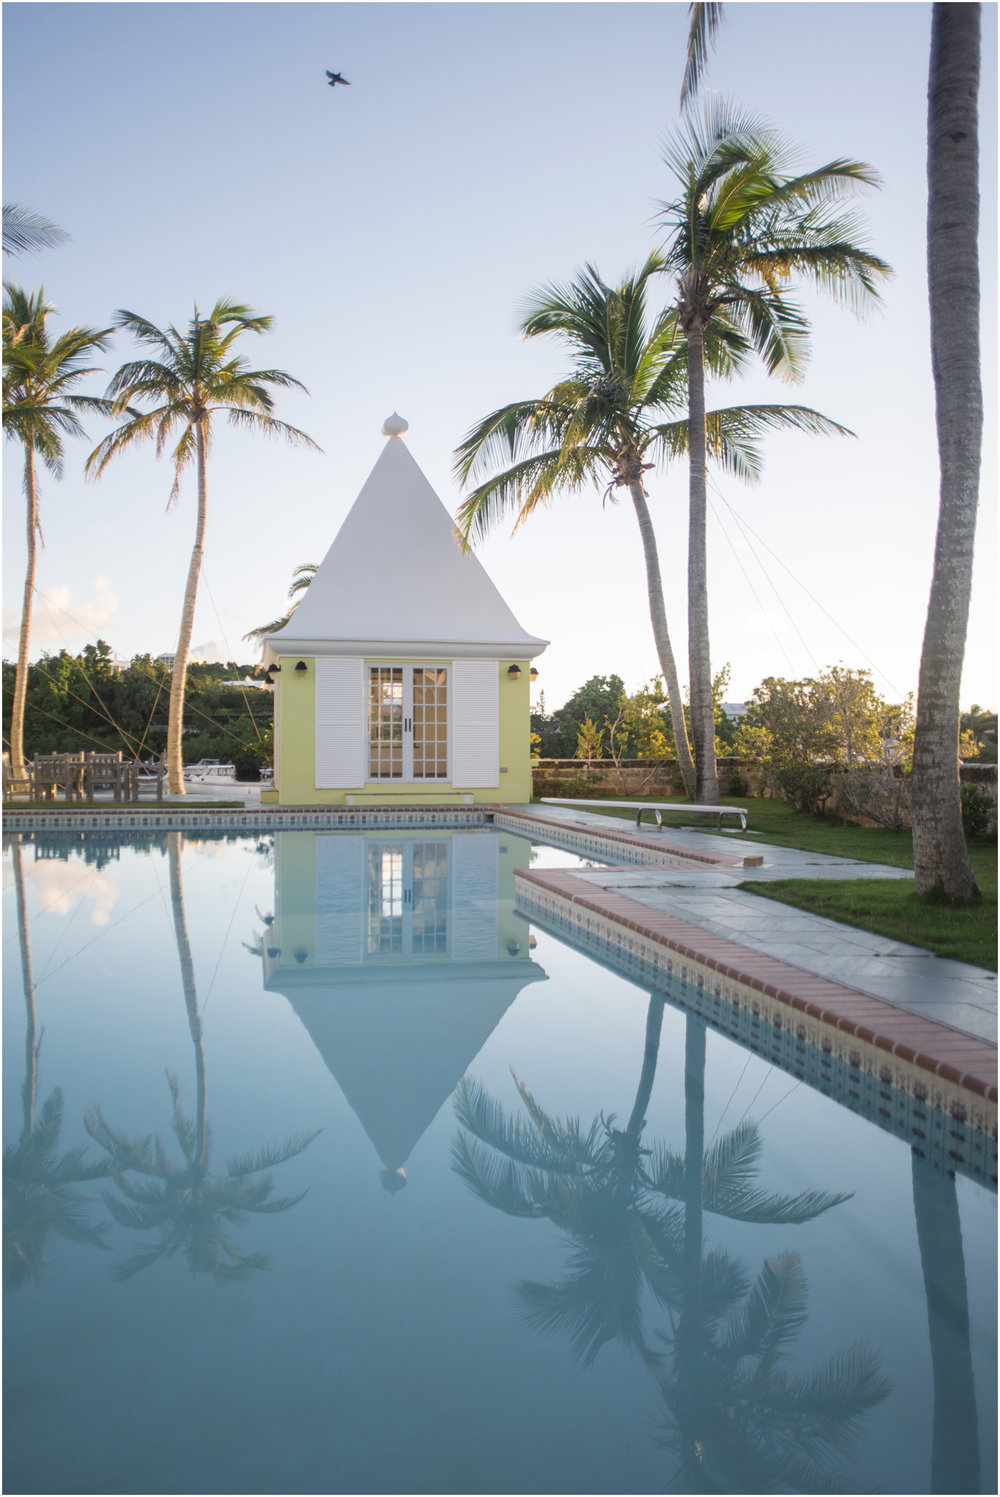 ©FianderFoto_Architecture_Bermuda_Palomera_025.jpg